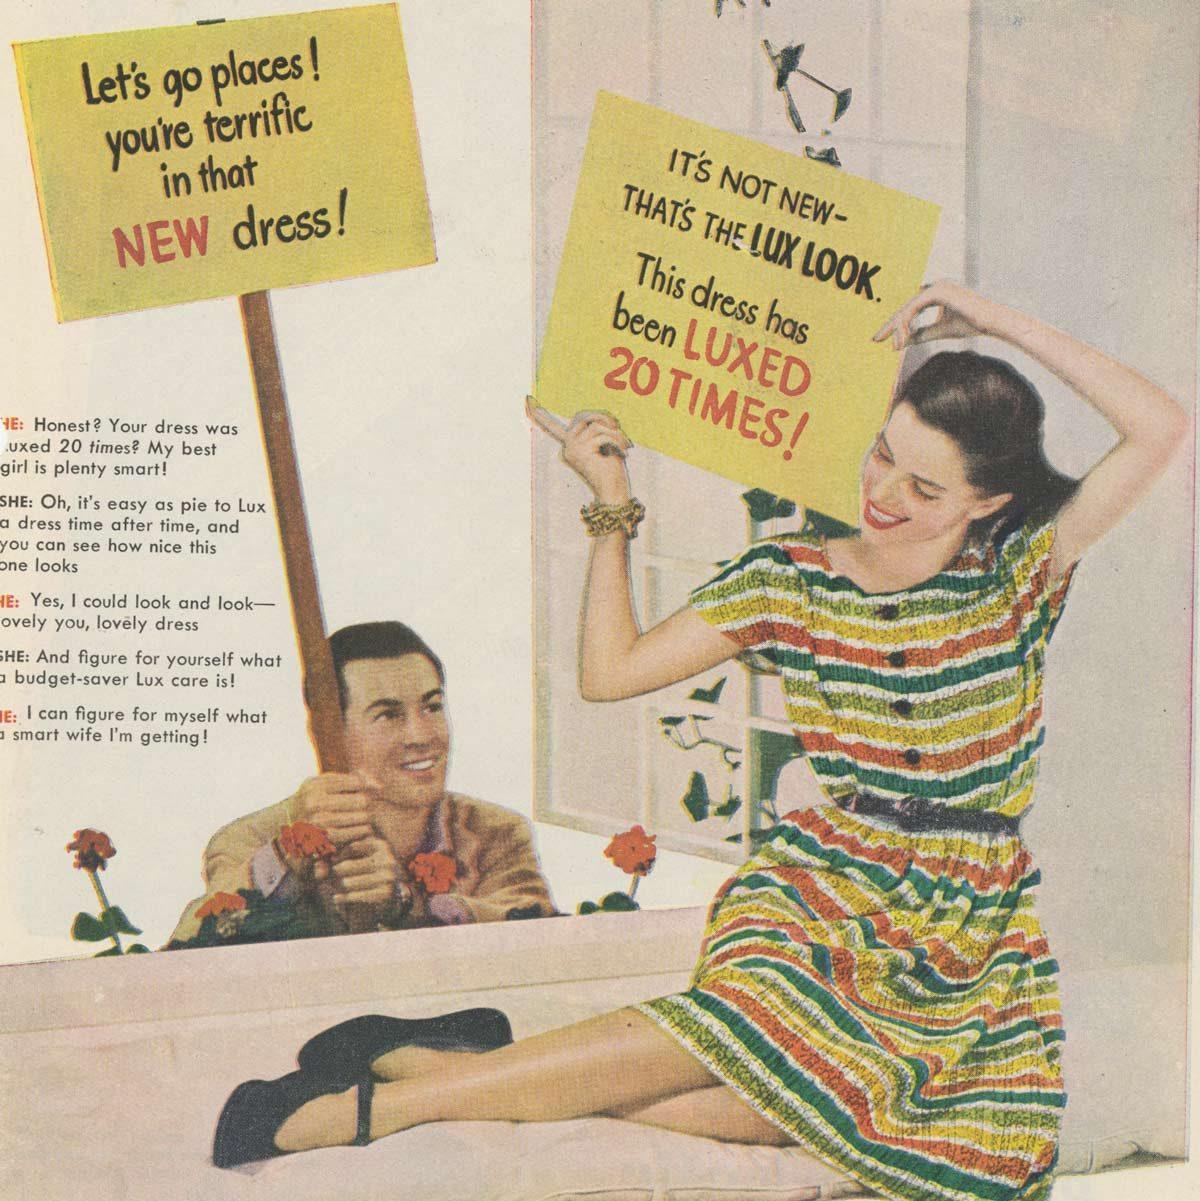 Lux vintage laundry detergent ad